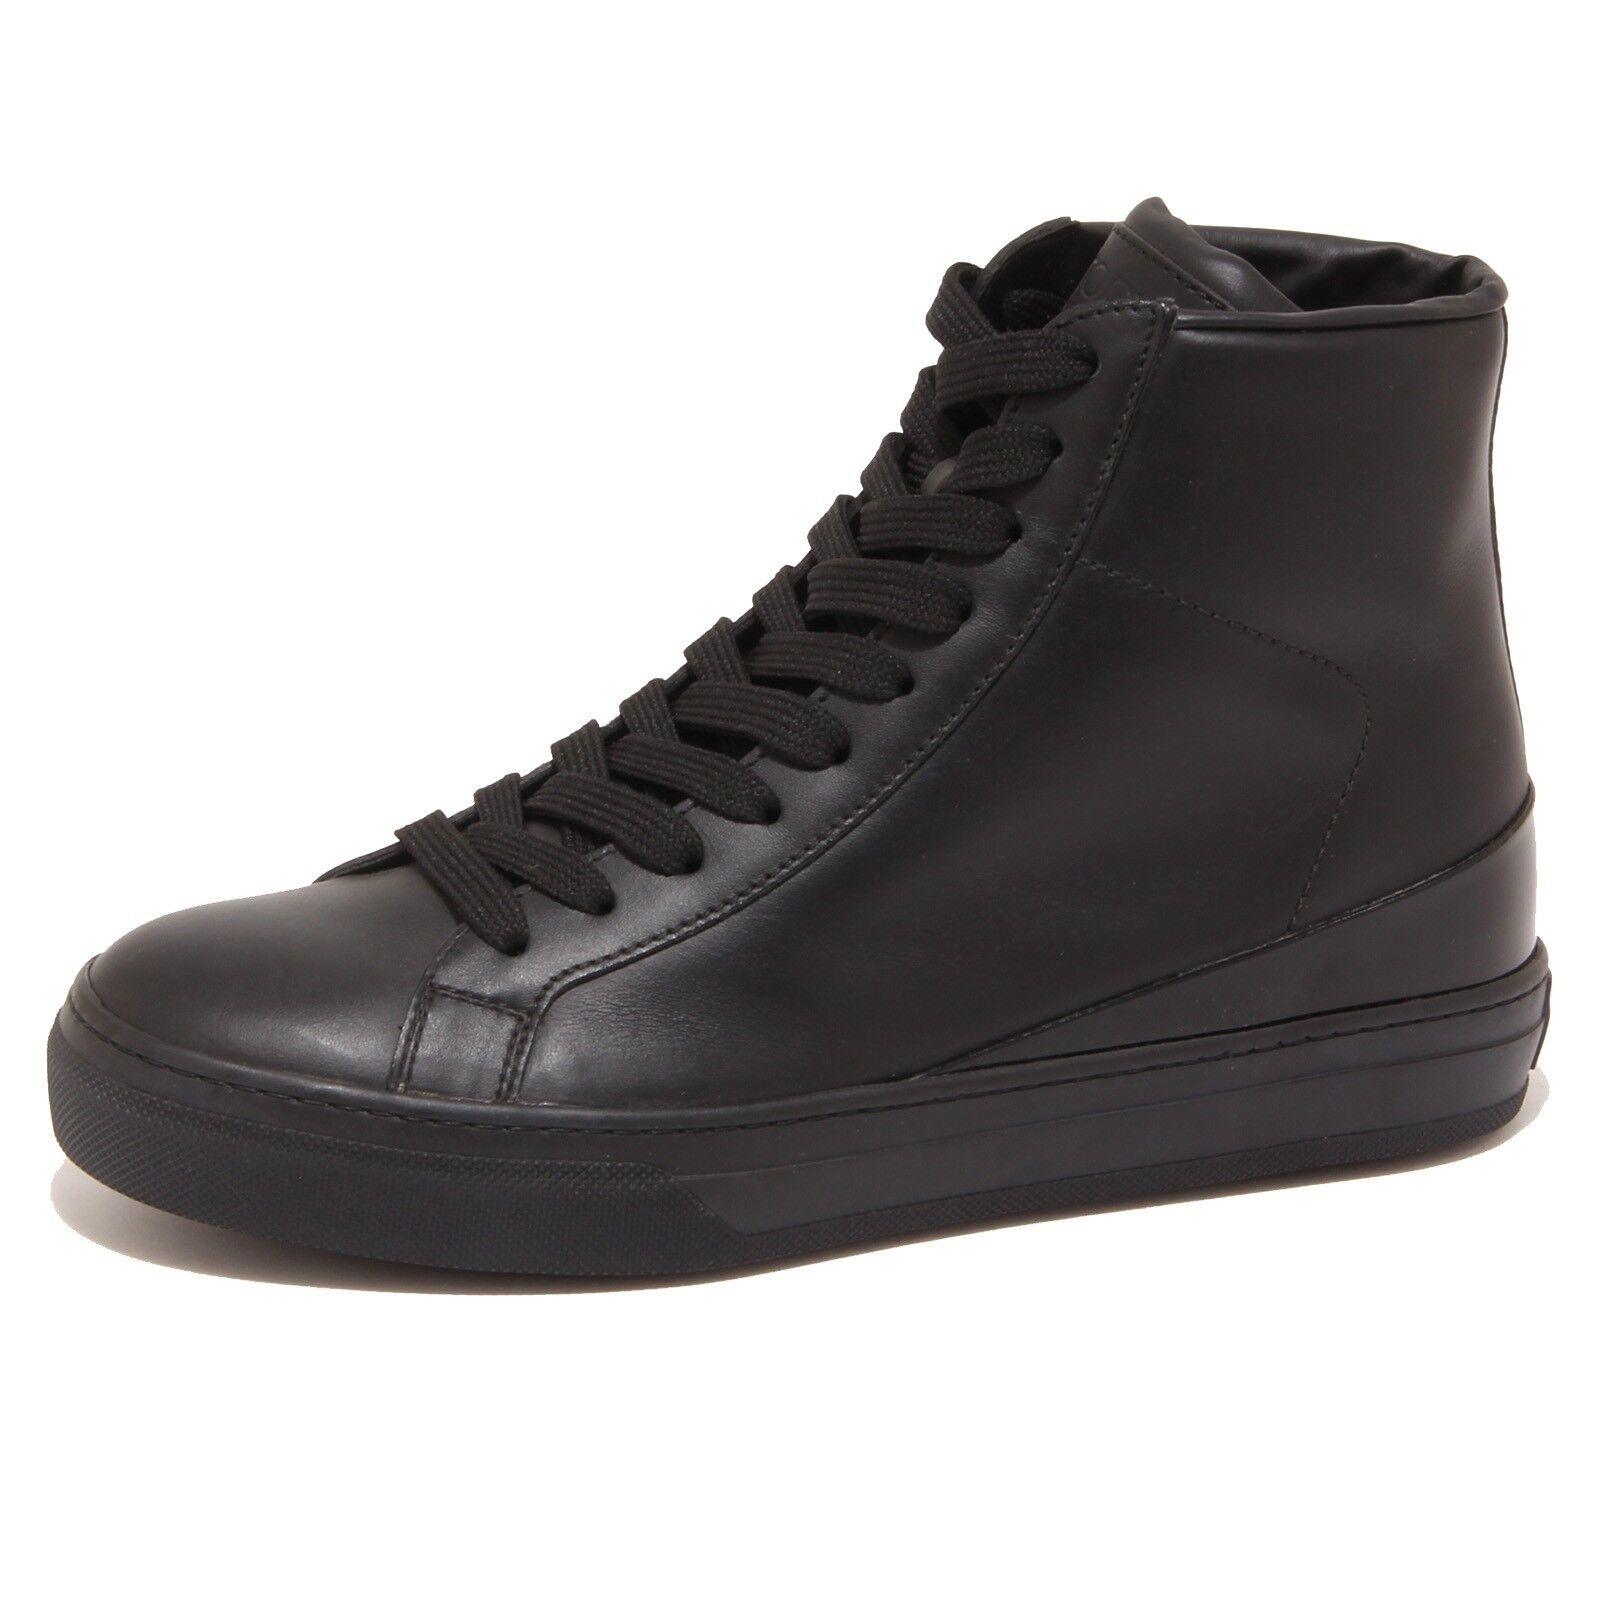 3307P scarpe da ginnastica TOD'S TOD'S TOD'S nero scarpa donna scarpe woman fdcfab